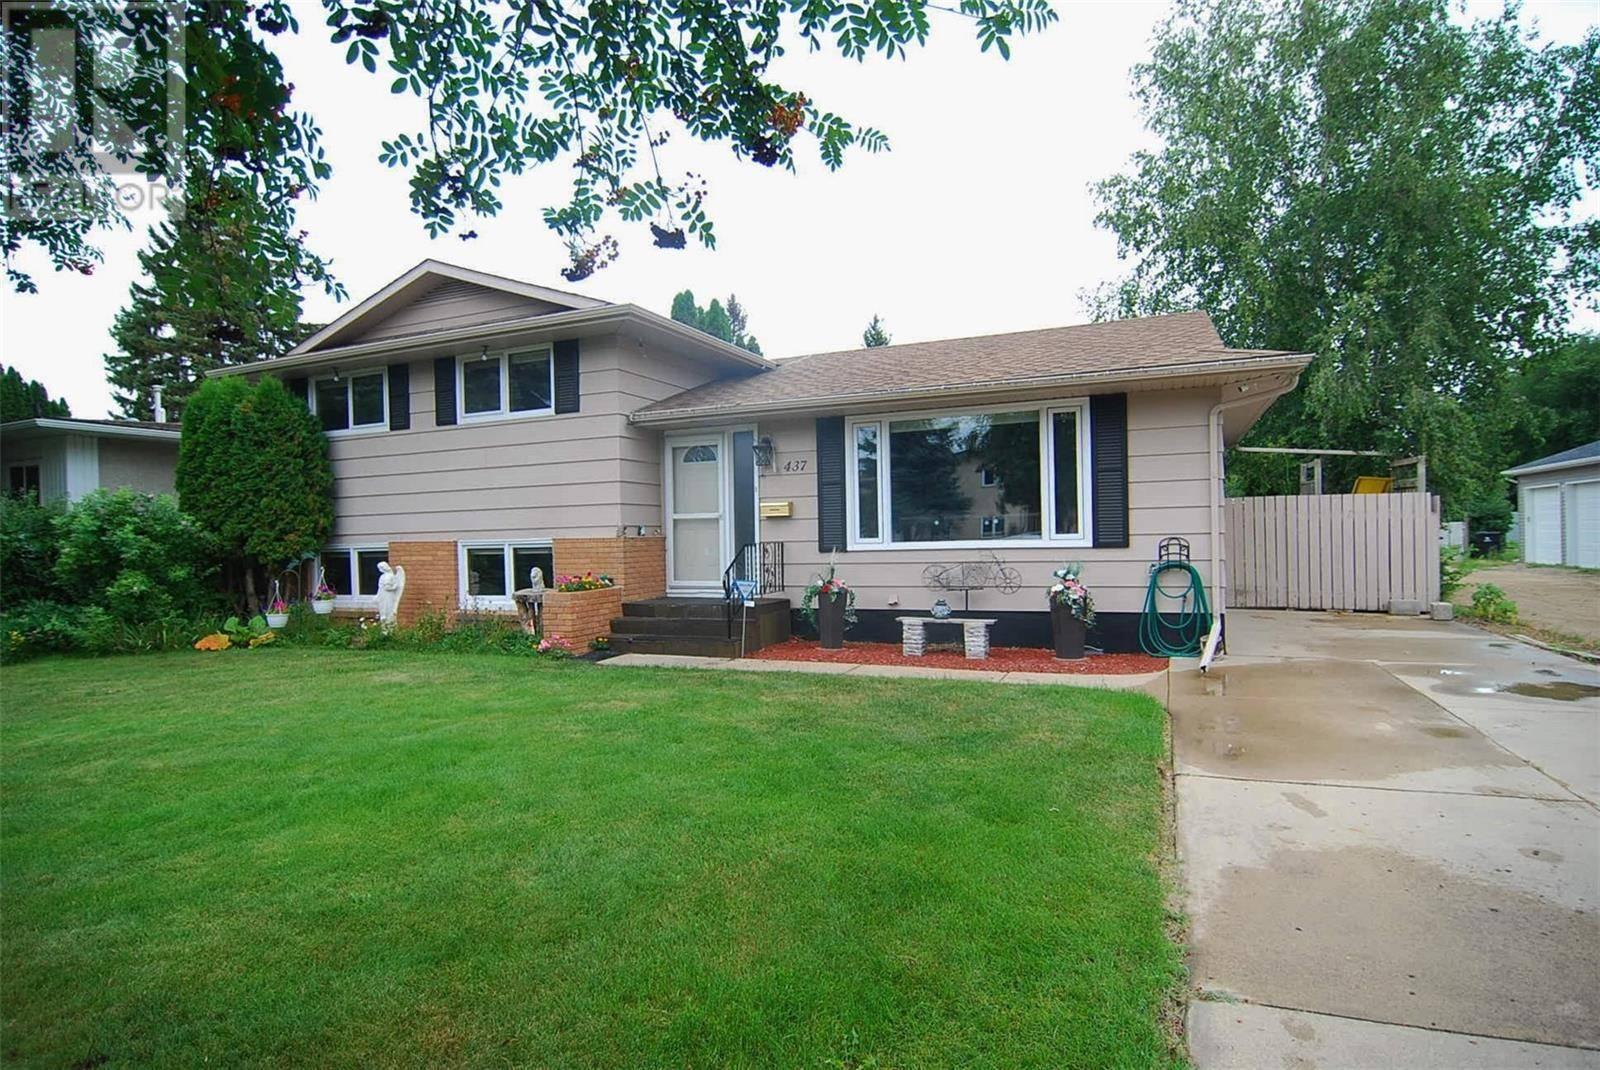 House for sale at 437 East Pl Saskatoon Saskatchewan - MLS: SK782861